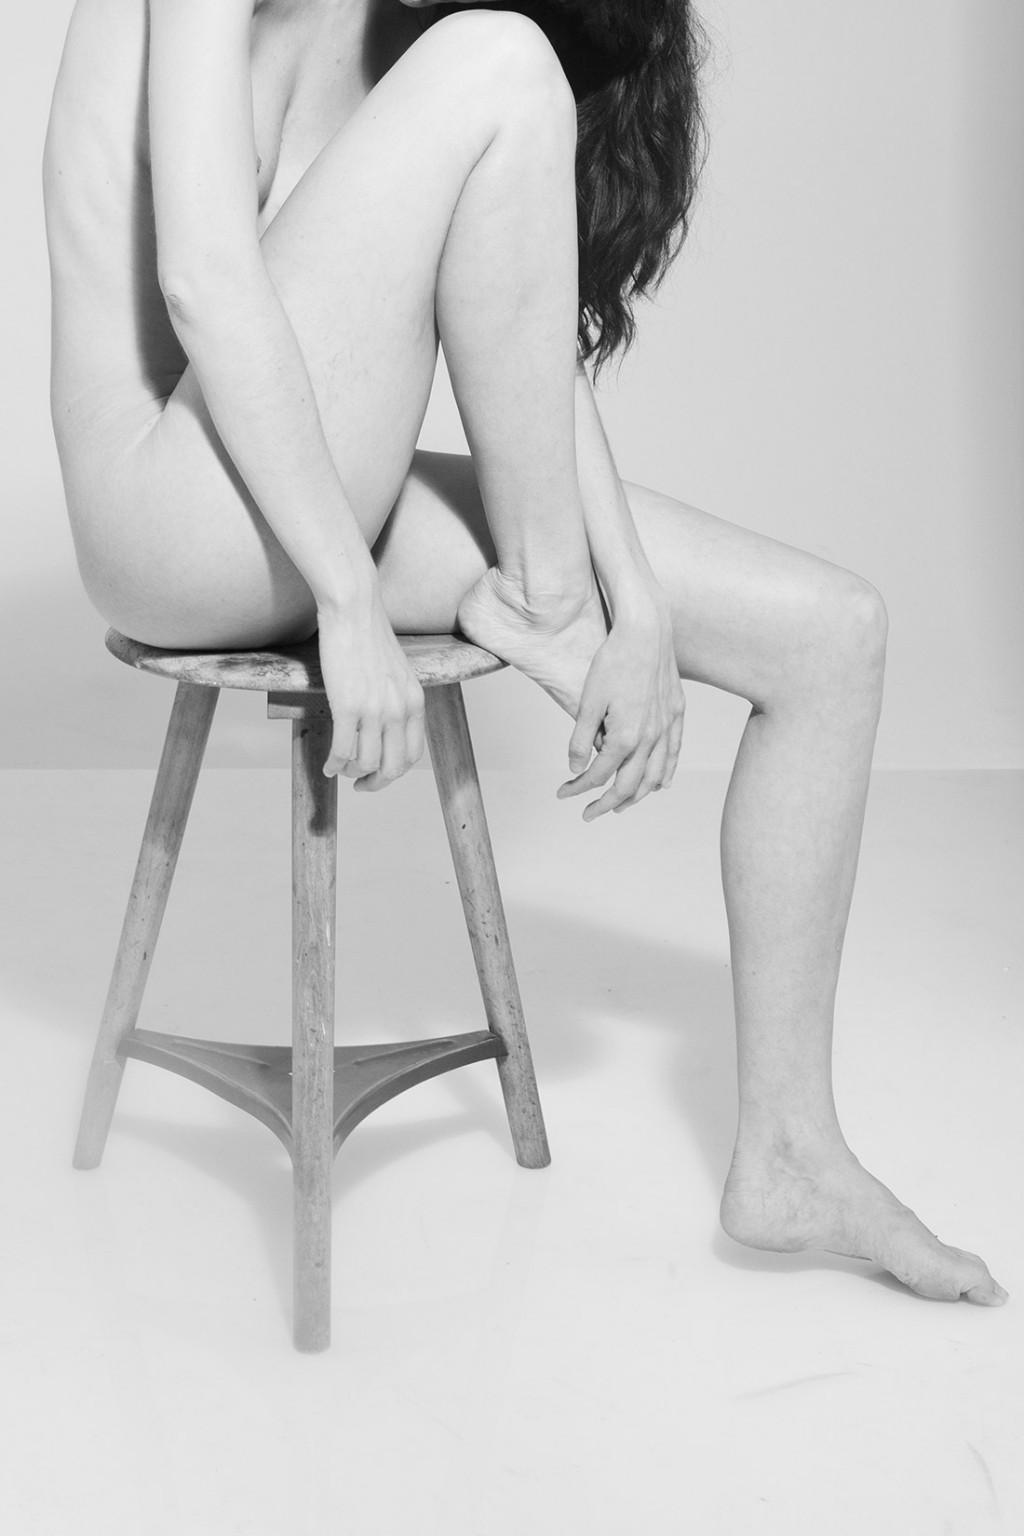 Kirsten Becken Nudes, Katharina